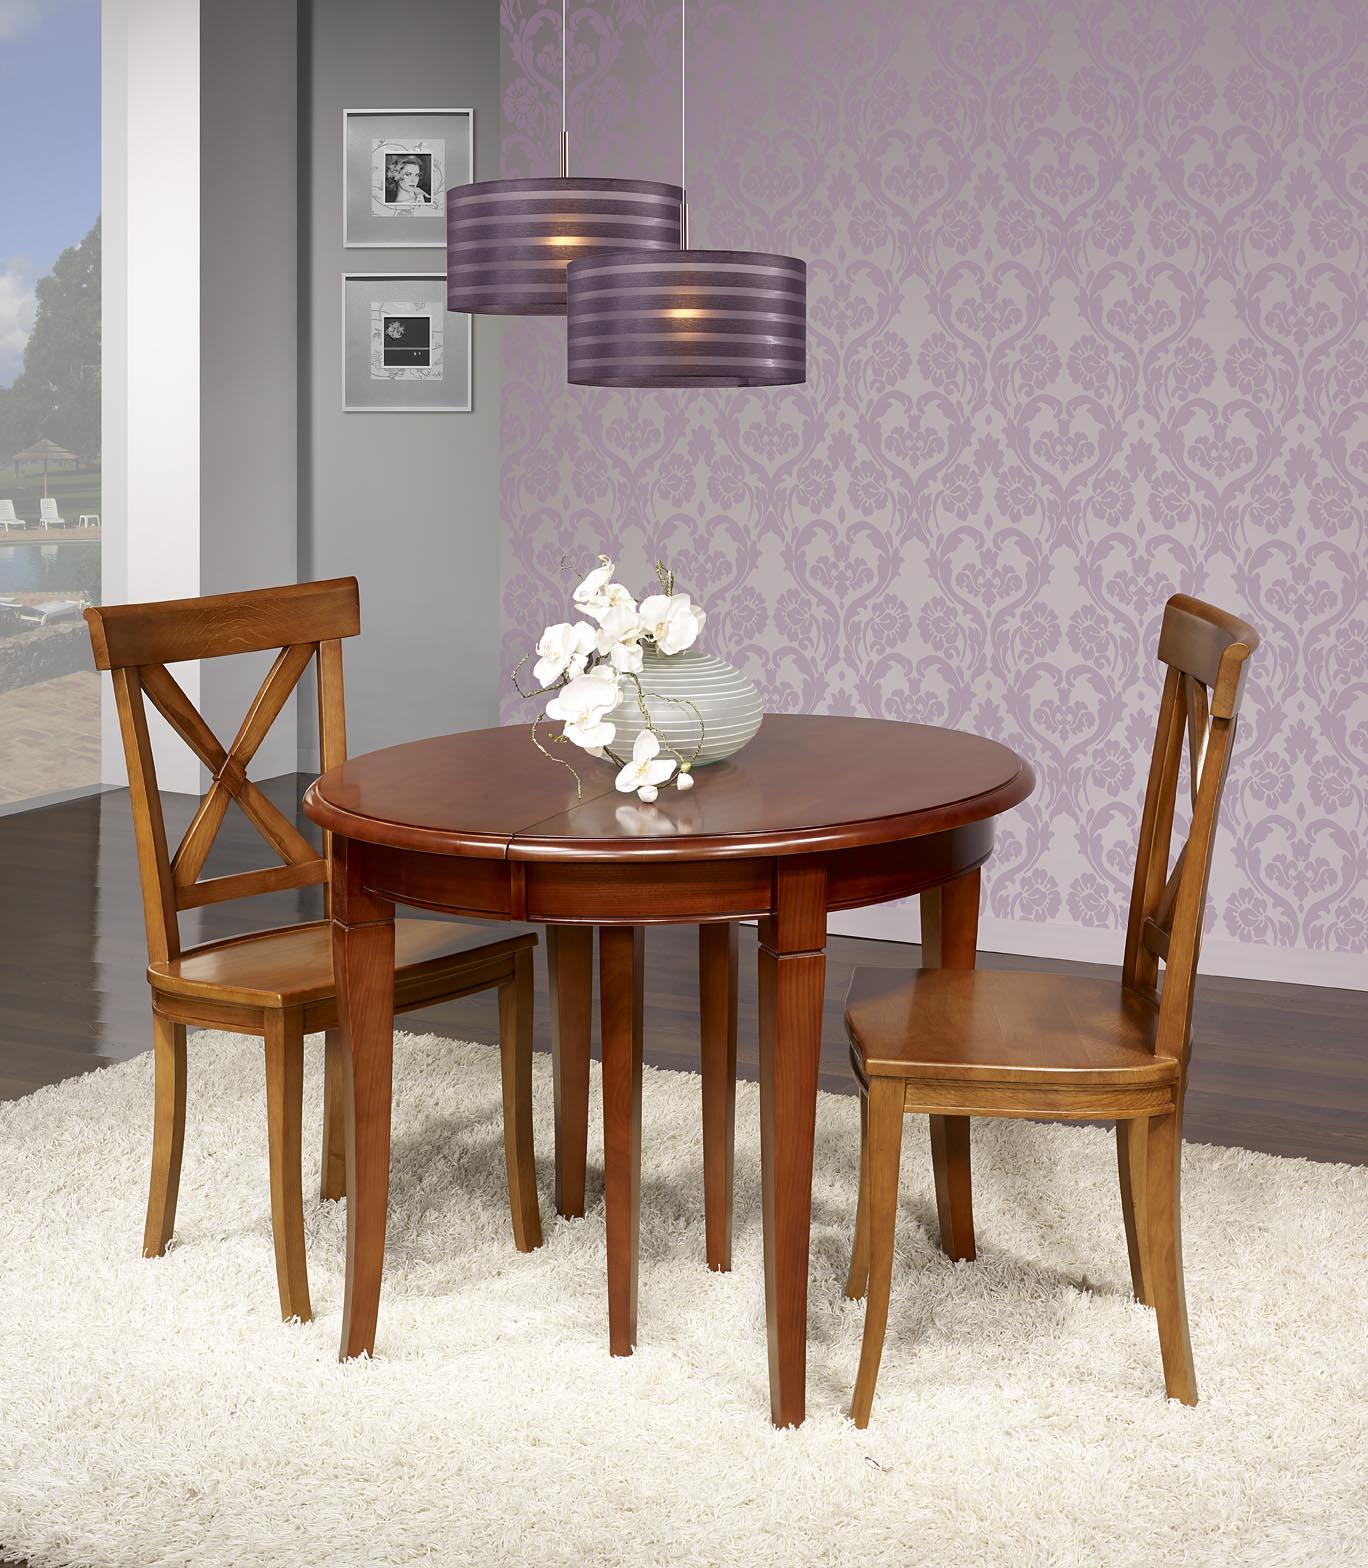 table ronde en merisier massif de sytle louis philippe diametre 100 meuble en merisier massif. Black Bedroom Furniture Sets. Home Design Ideas